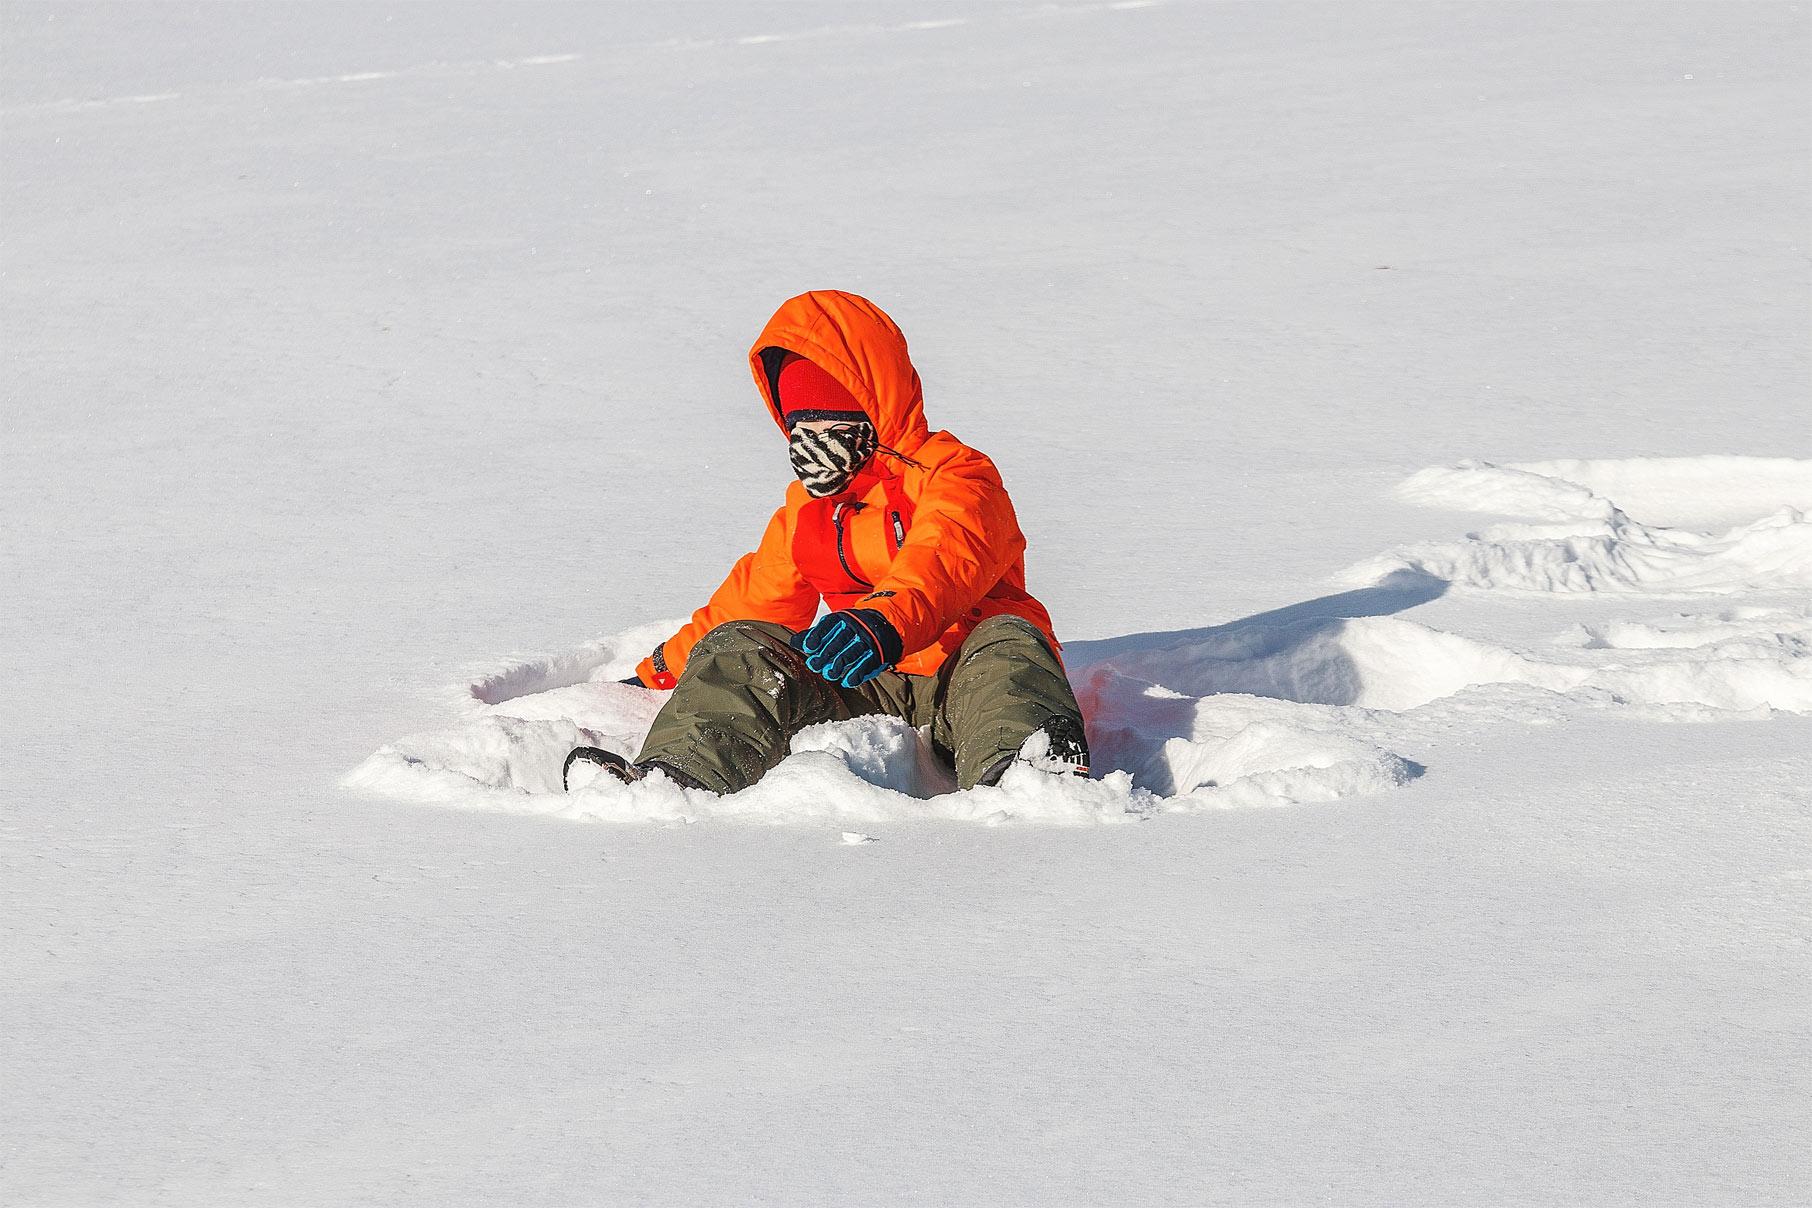 ניקוי בגדי סקי